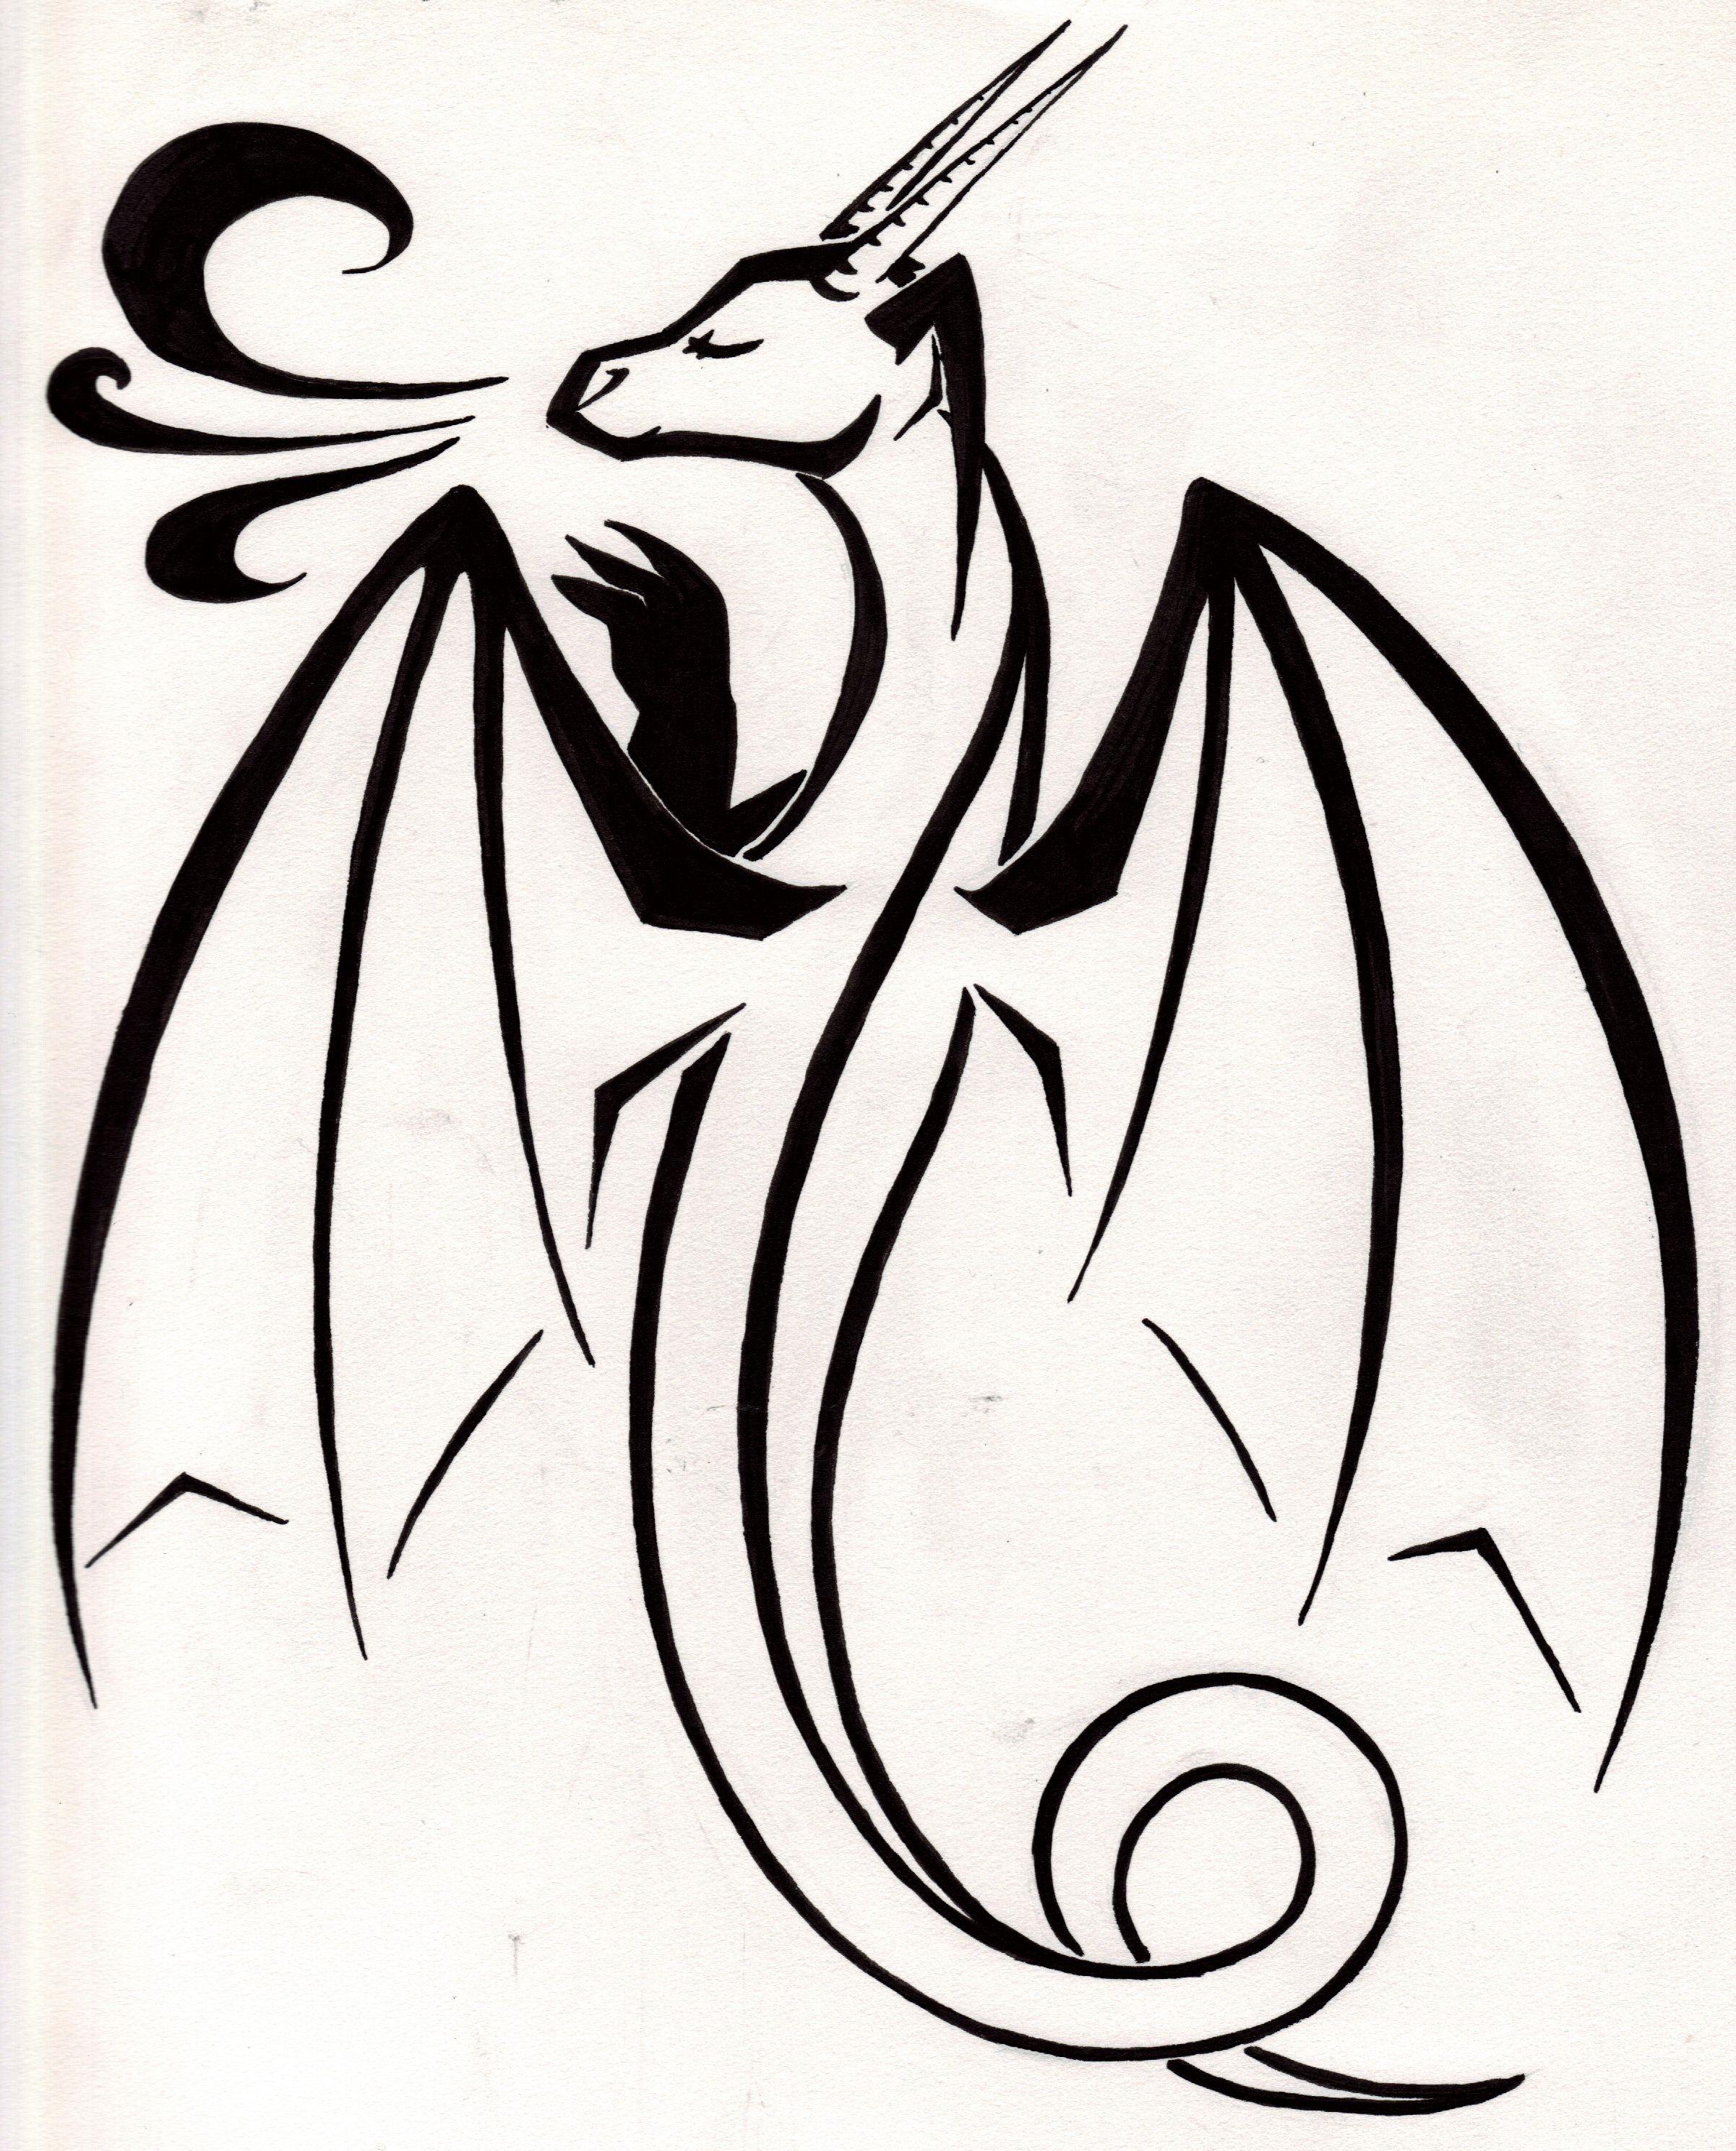 Simple_Dragon_Tattoo_by_TsukiTsu.jpg (2402×2976) Small